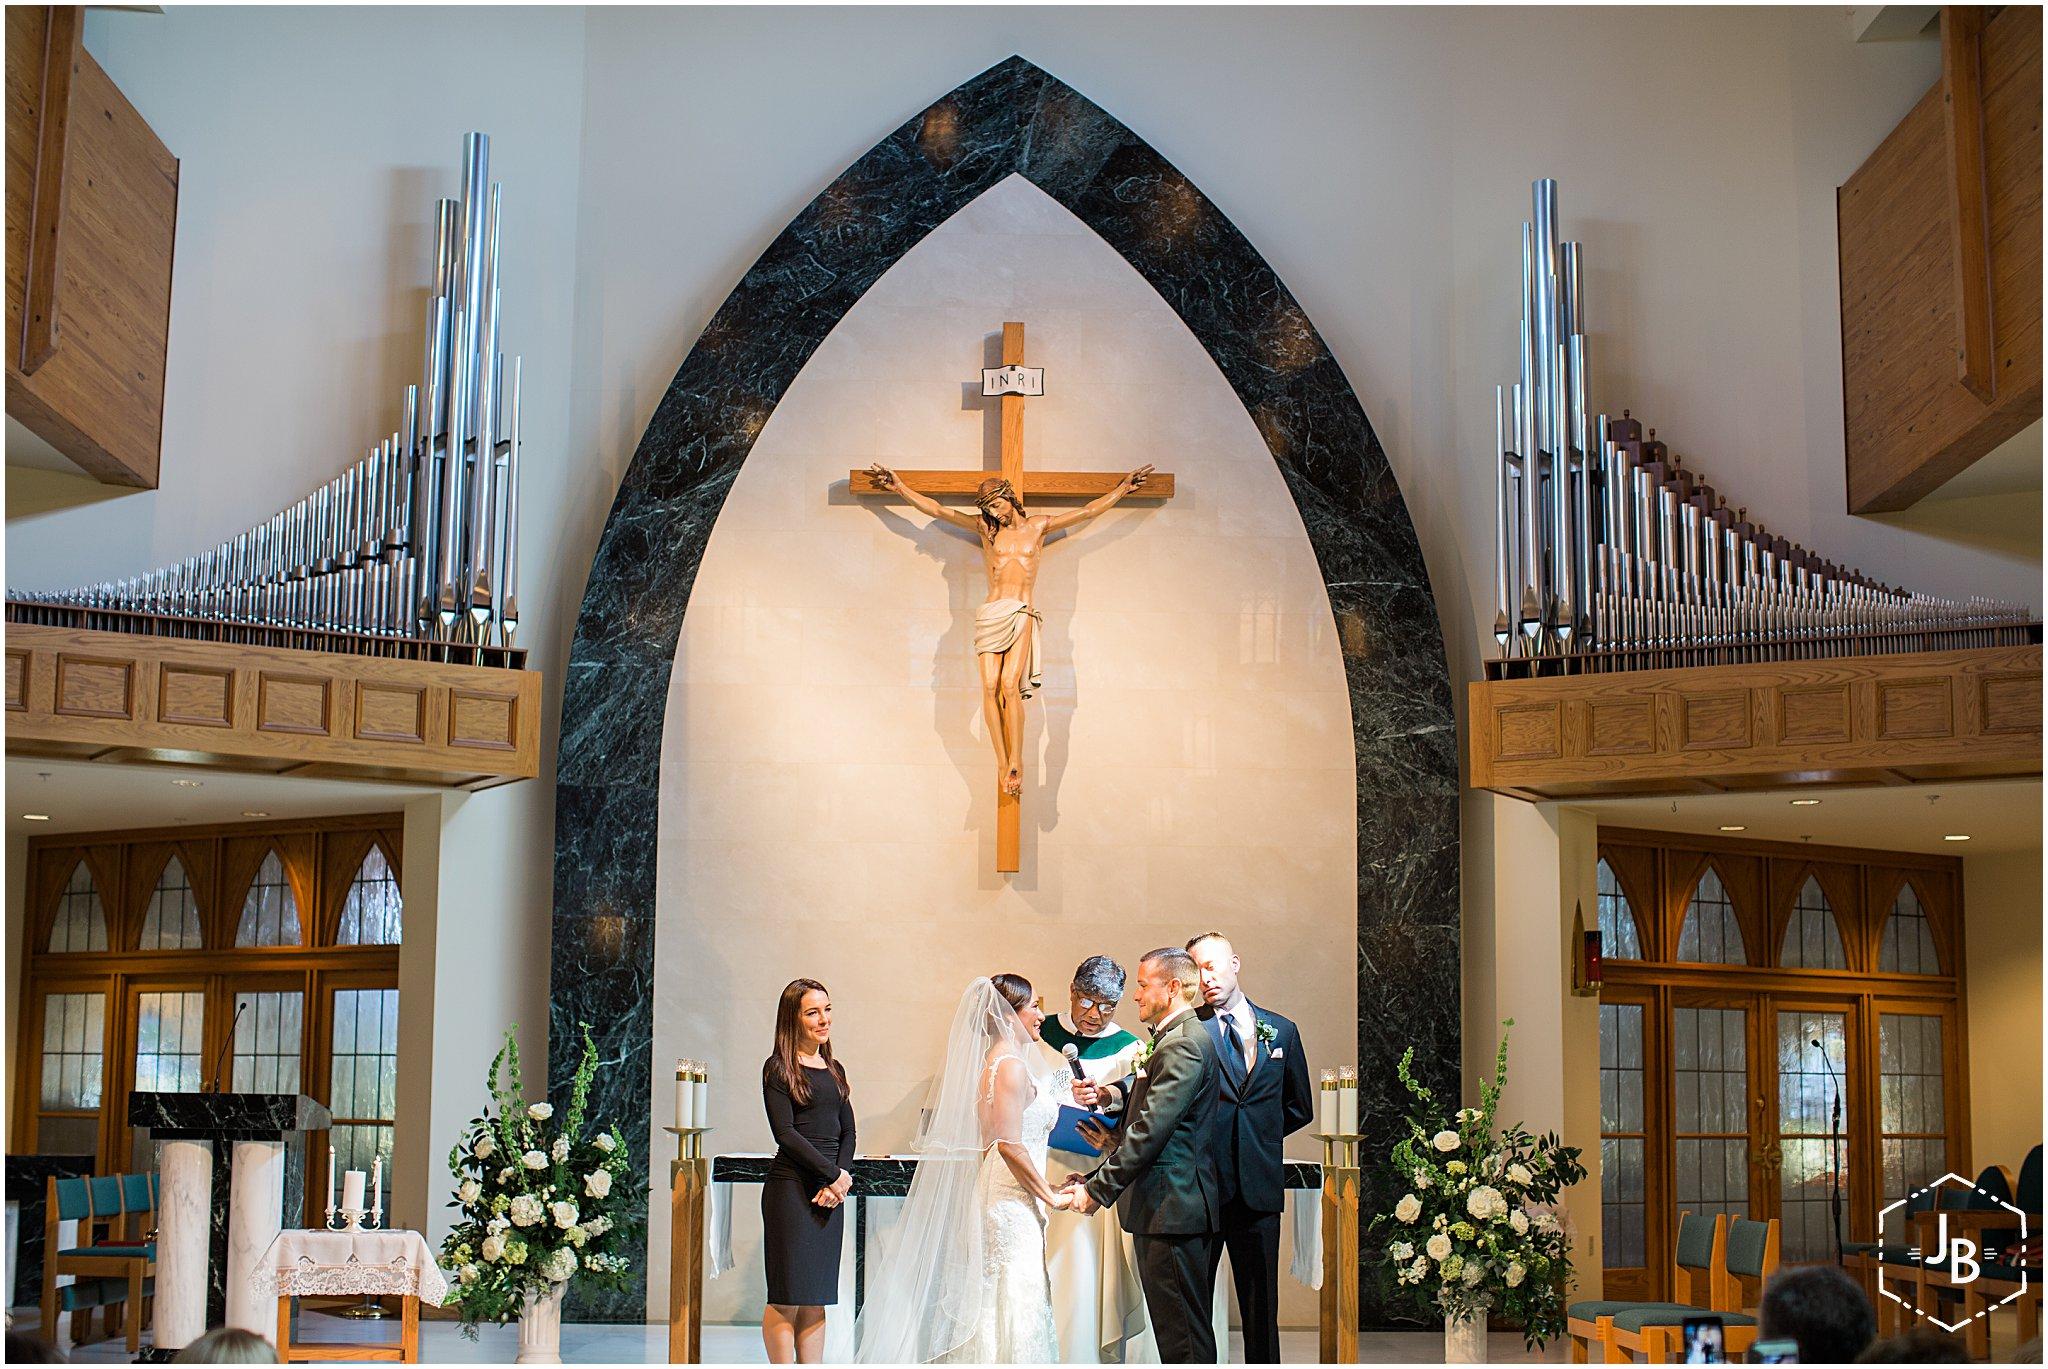 WeddingandEngagementFloridaPhotographer_0208.jpg